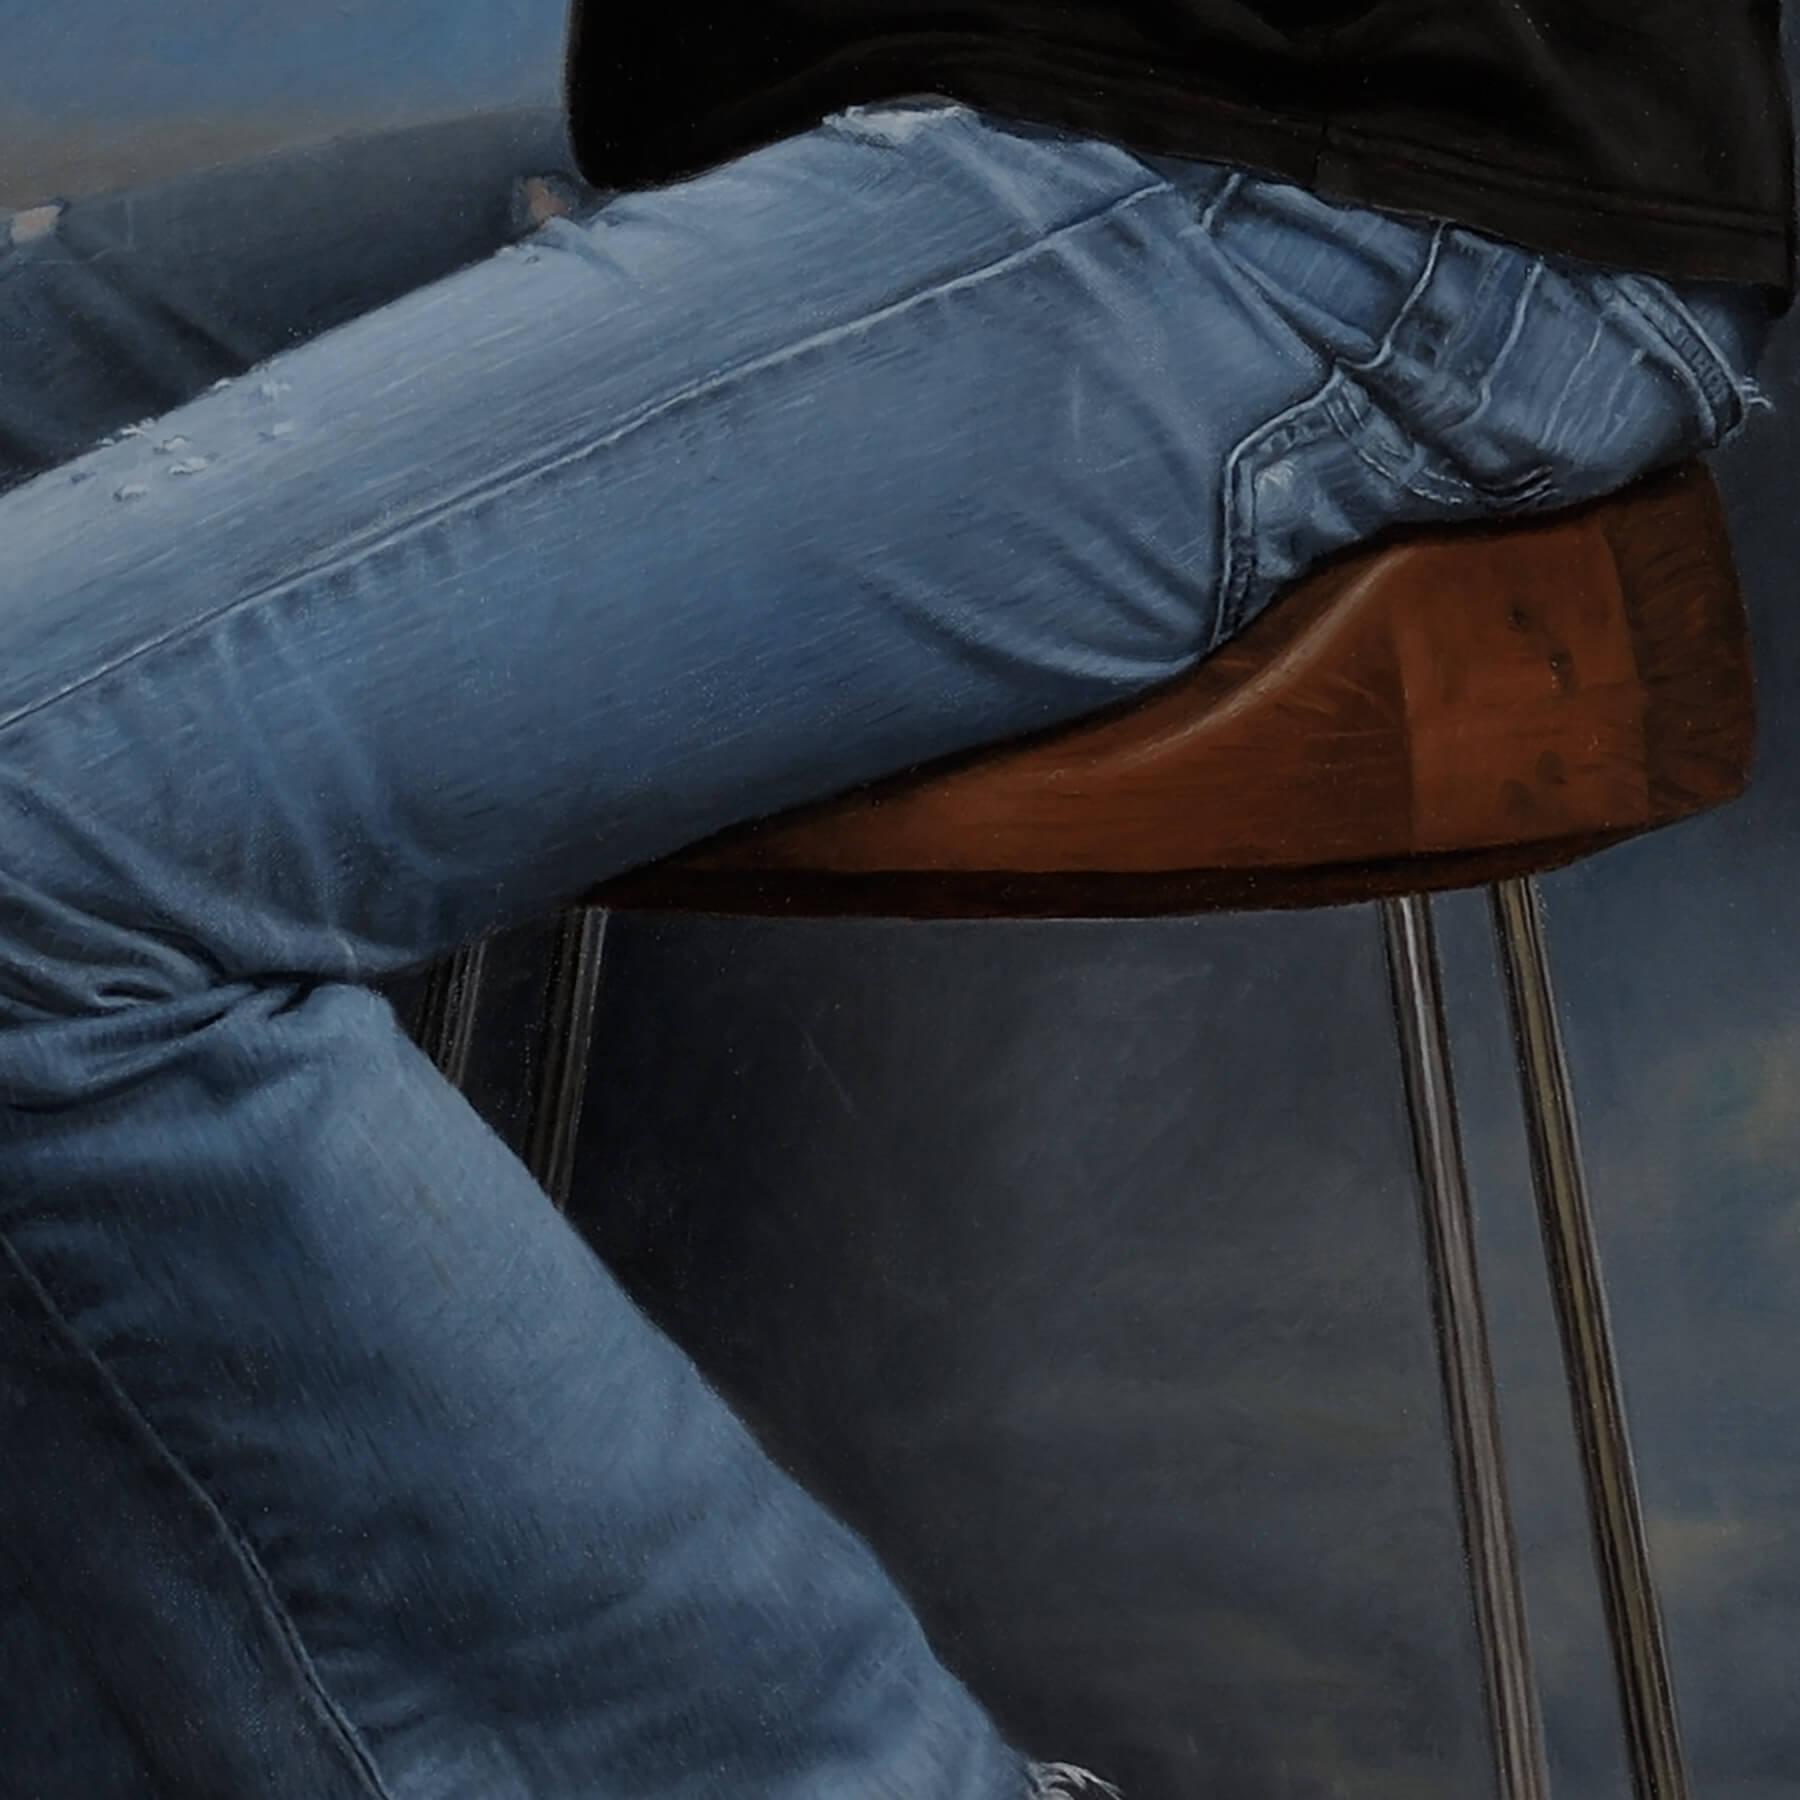 Fine Art Contemporary OilCommission; blue jeans texture